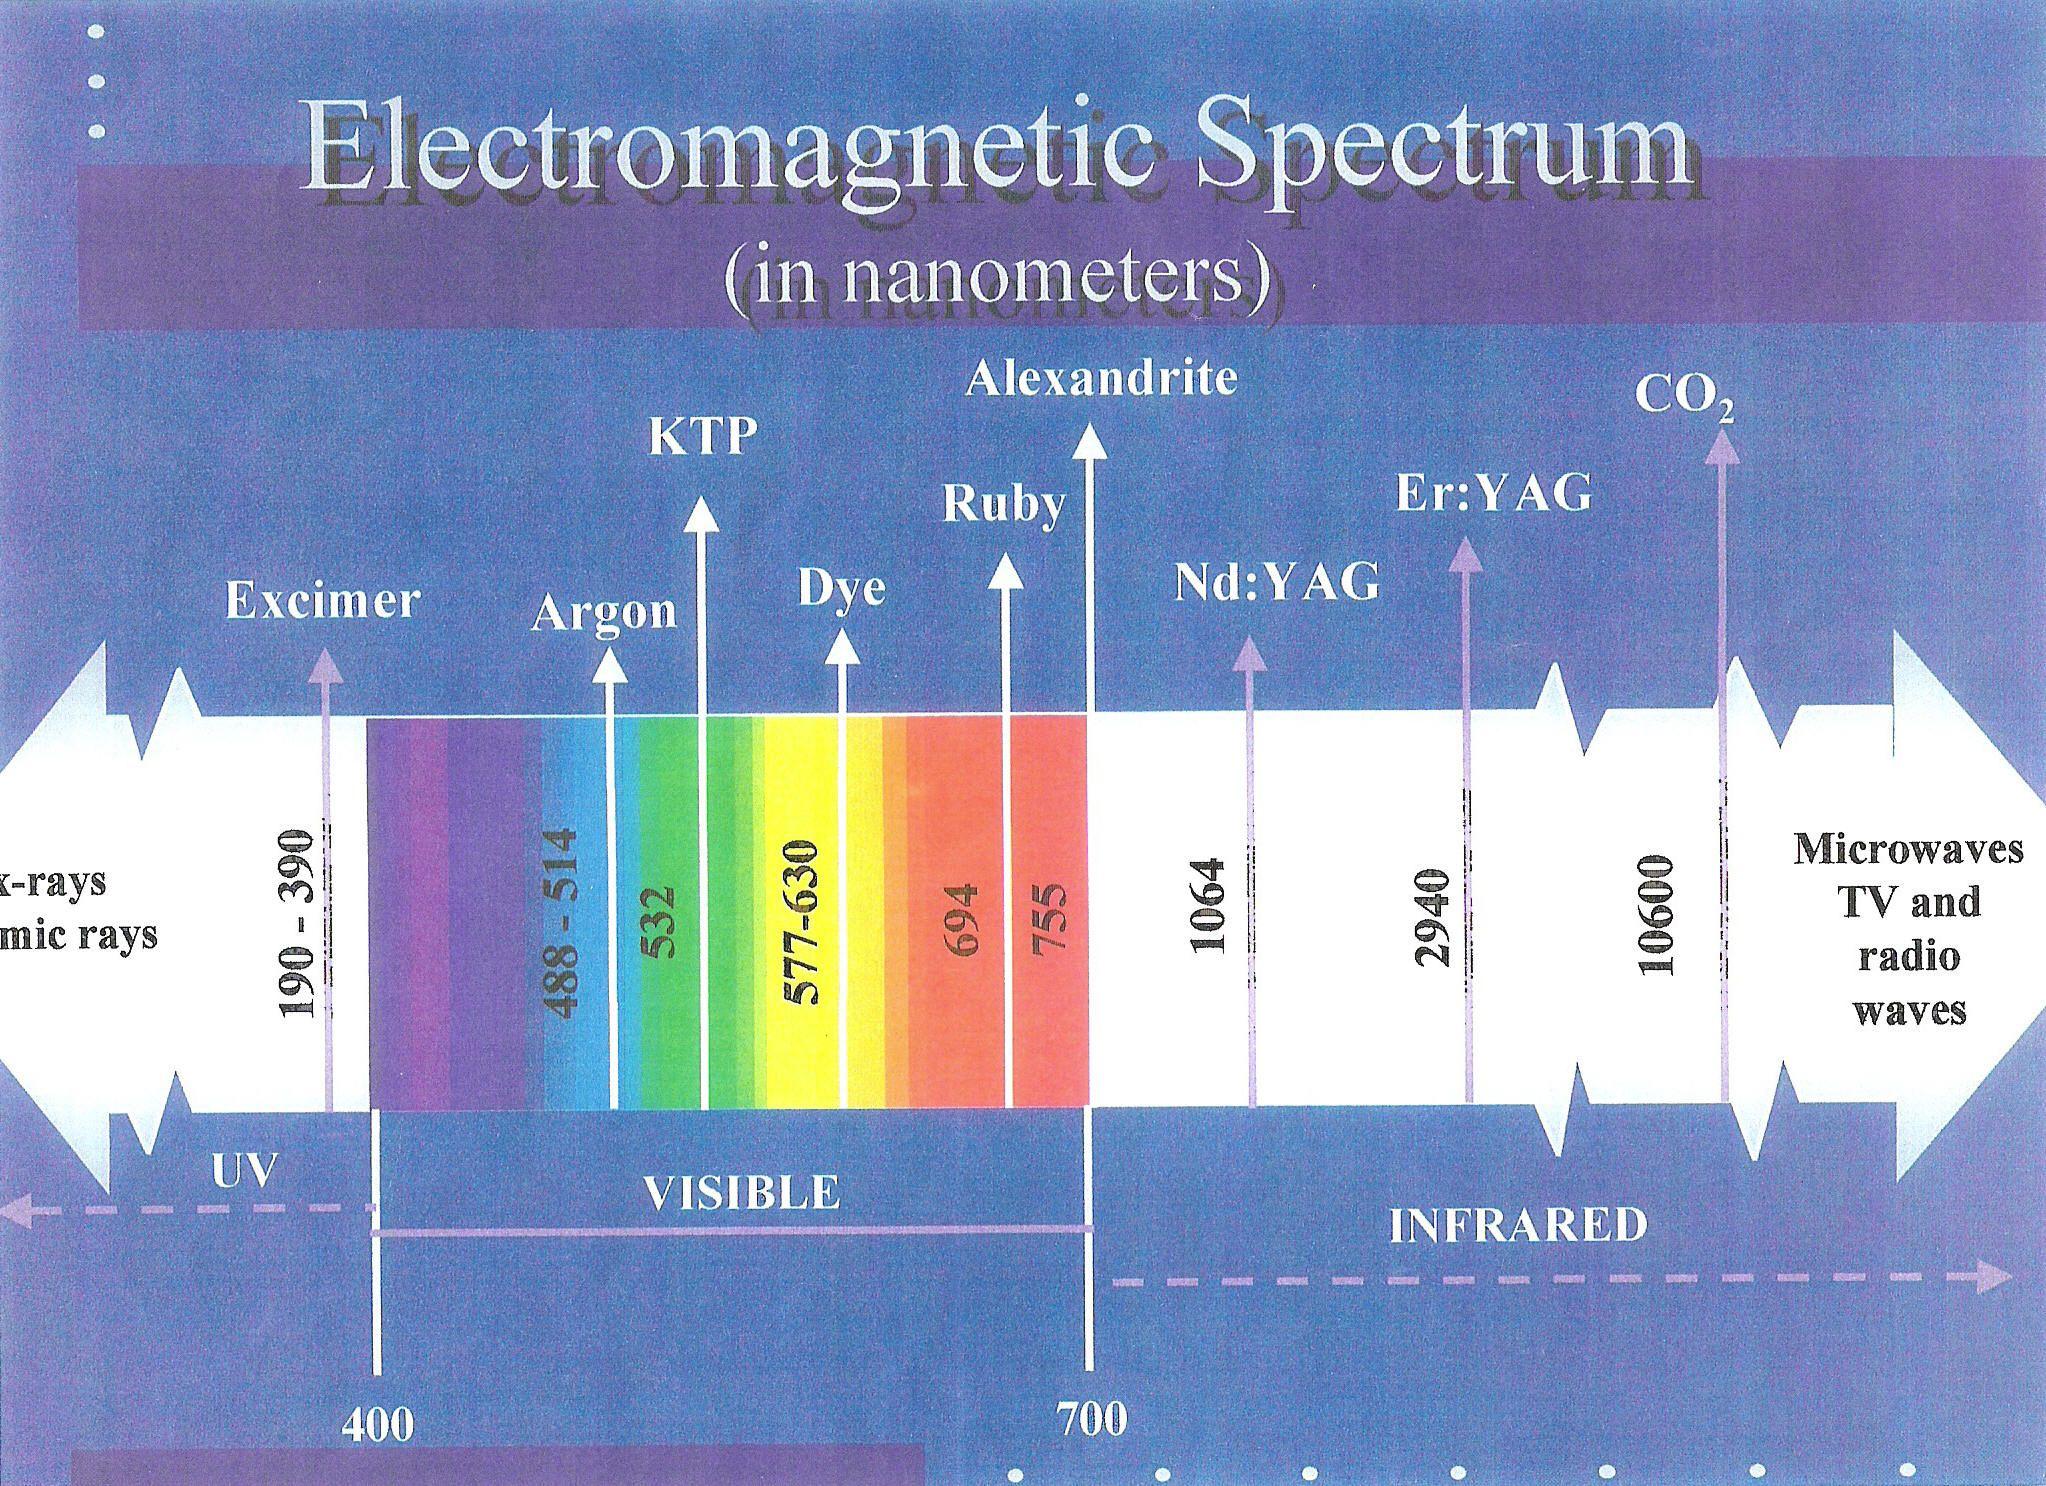 Electromagnetic Spectrum In Nm Electromagnetic Spectrum Cosmetics Laser Aesthetic Medicine